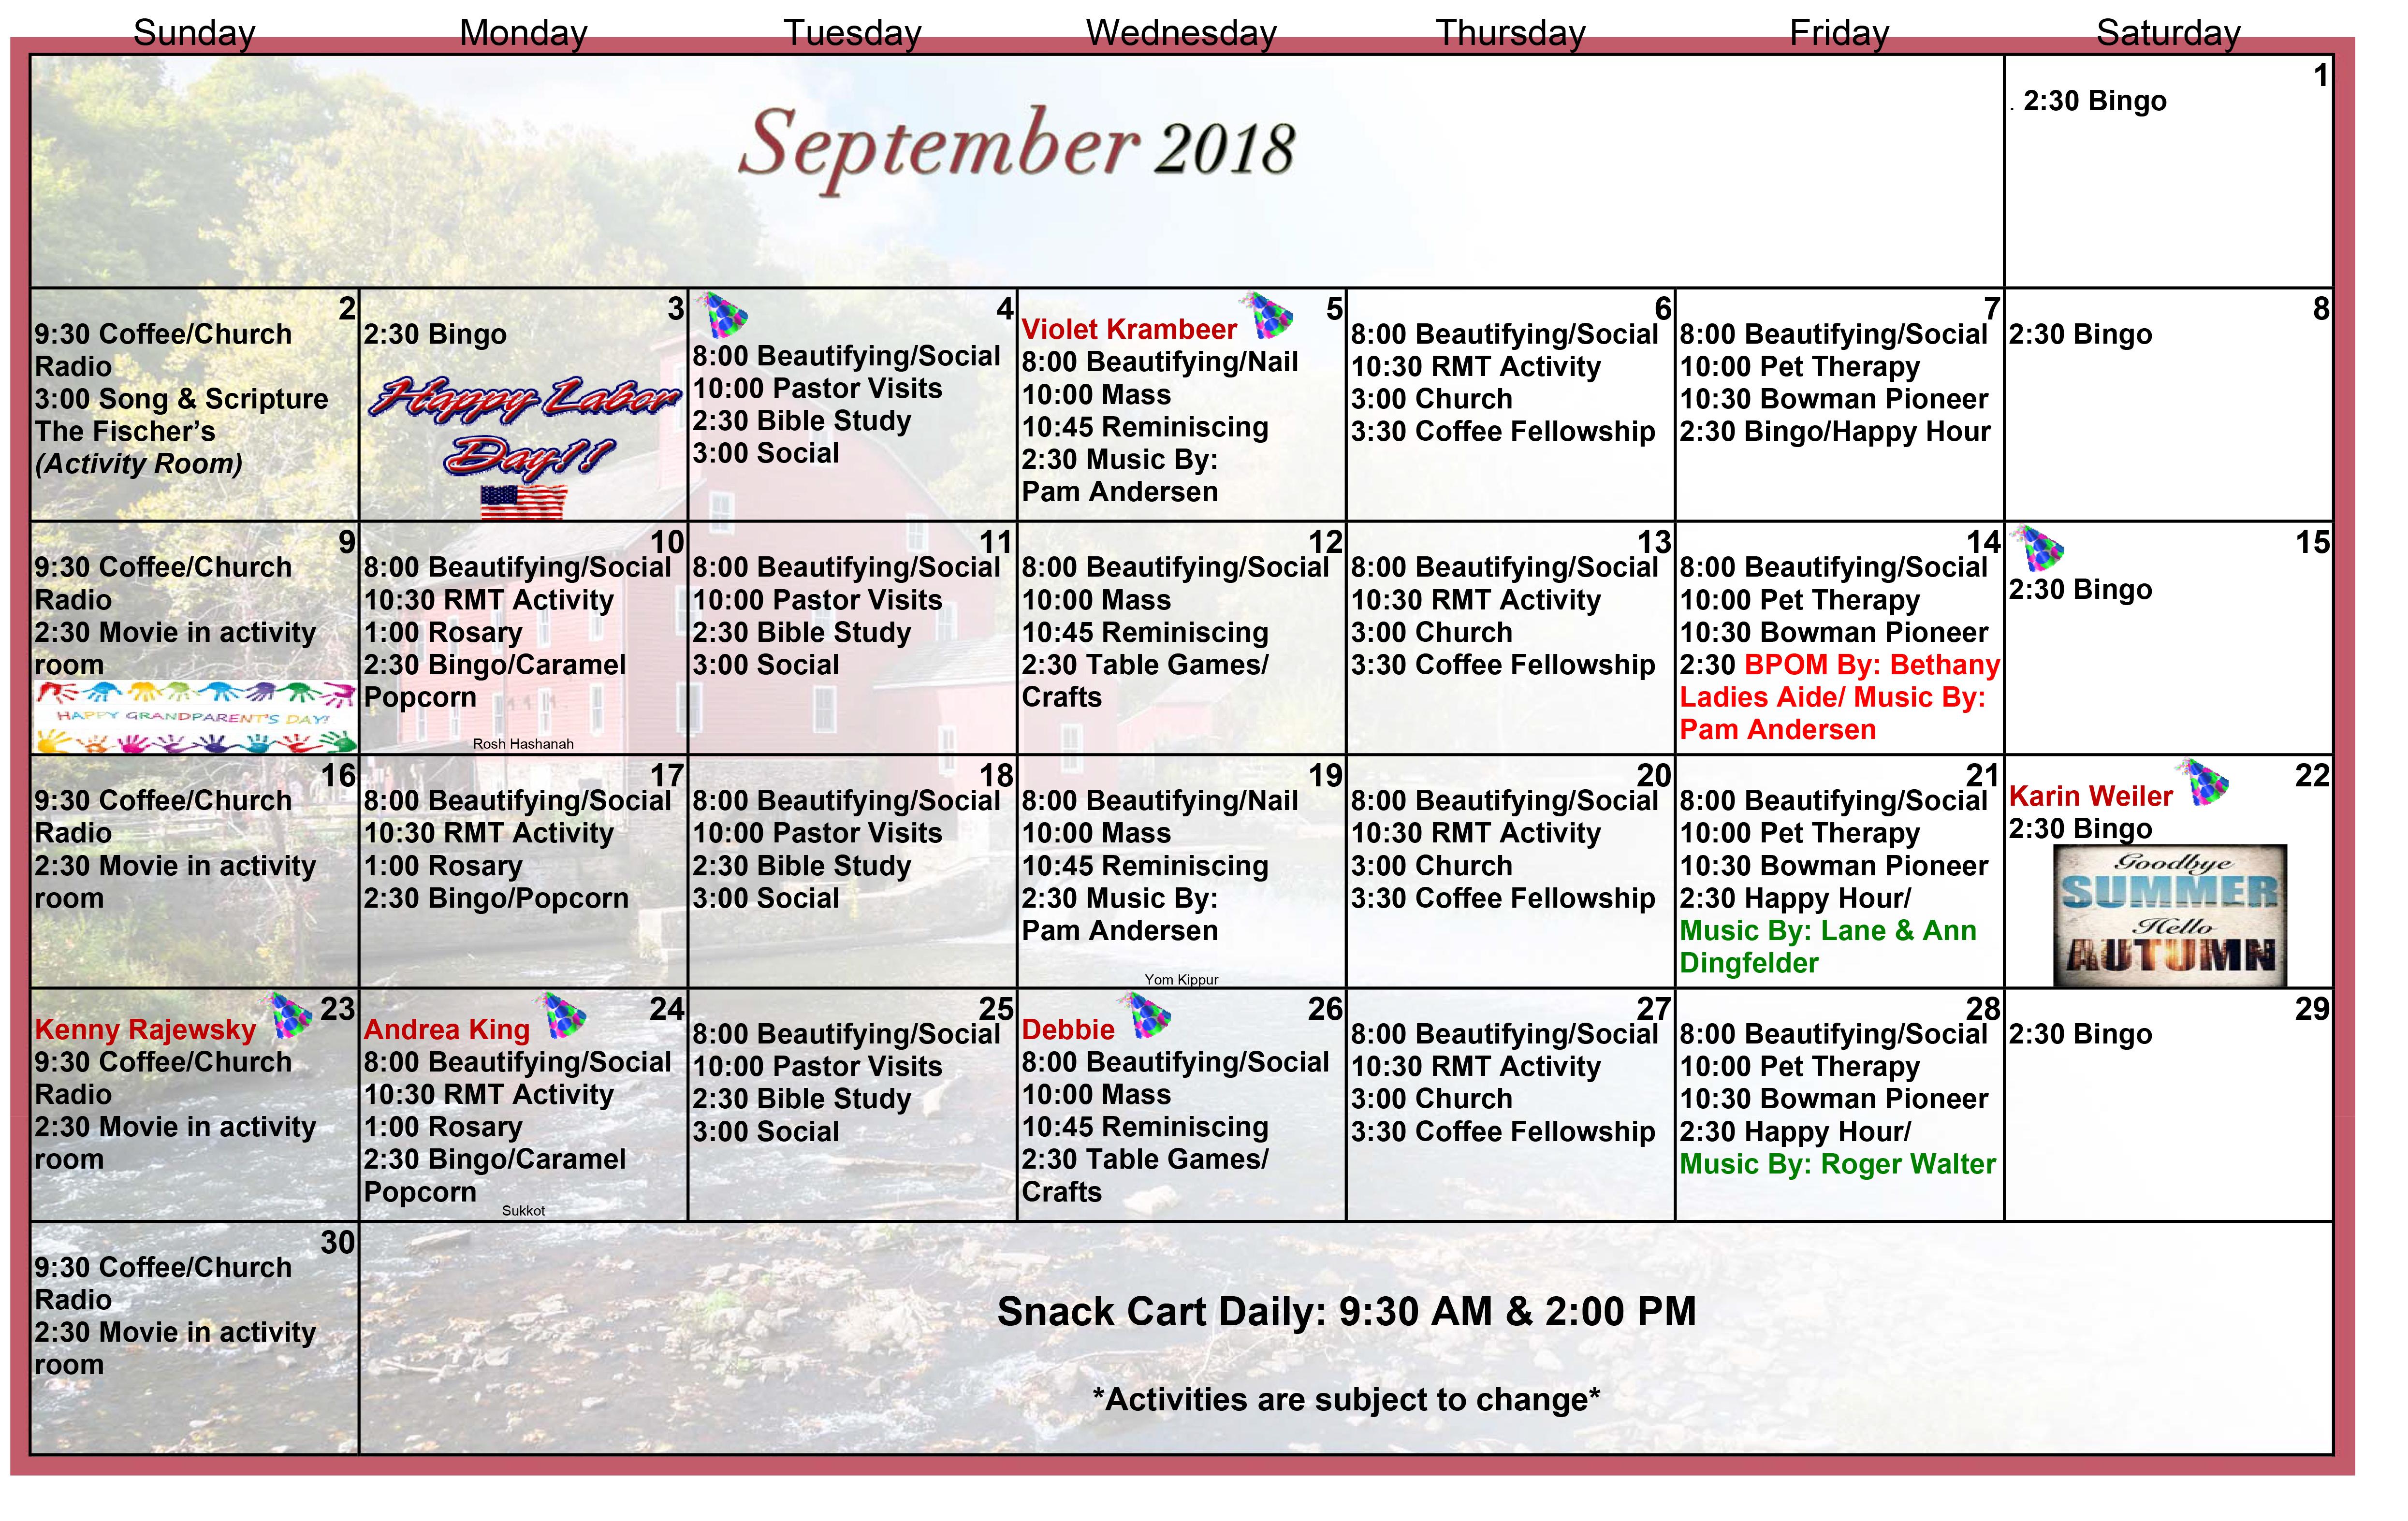 September 2018 Event Calendar